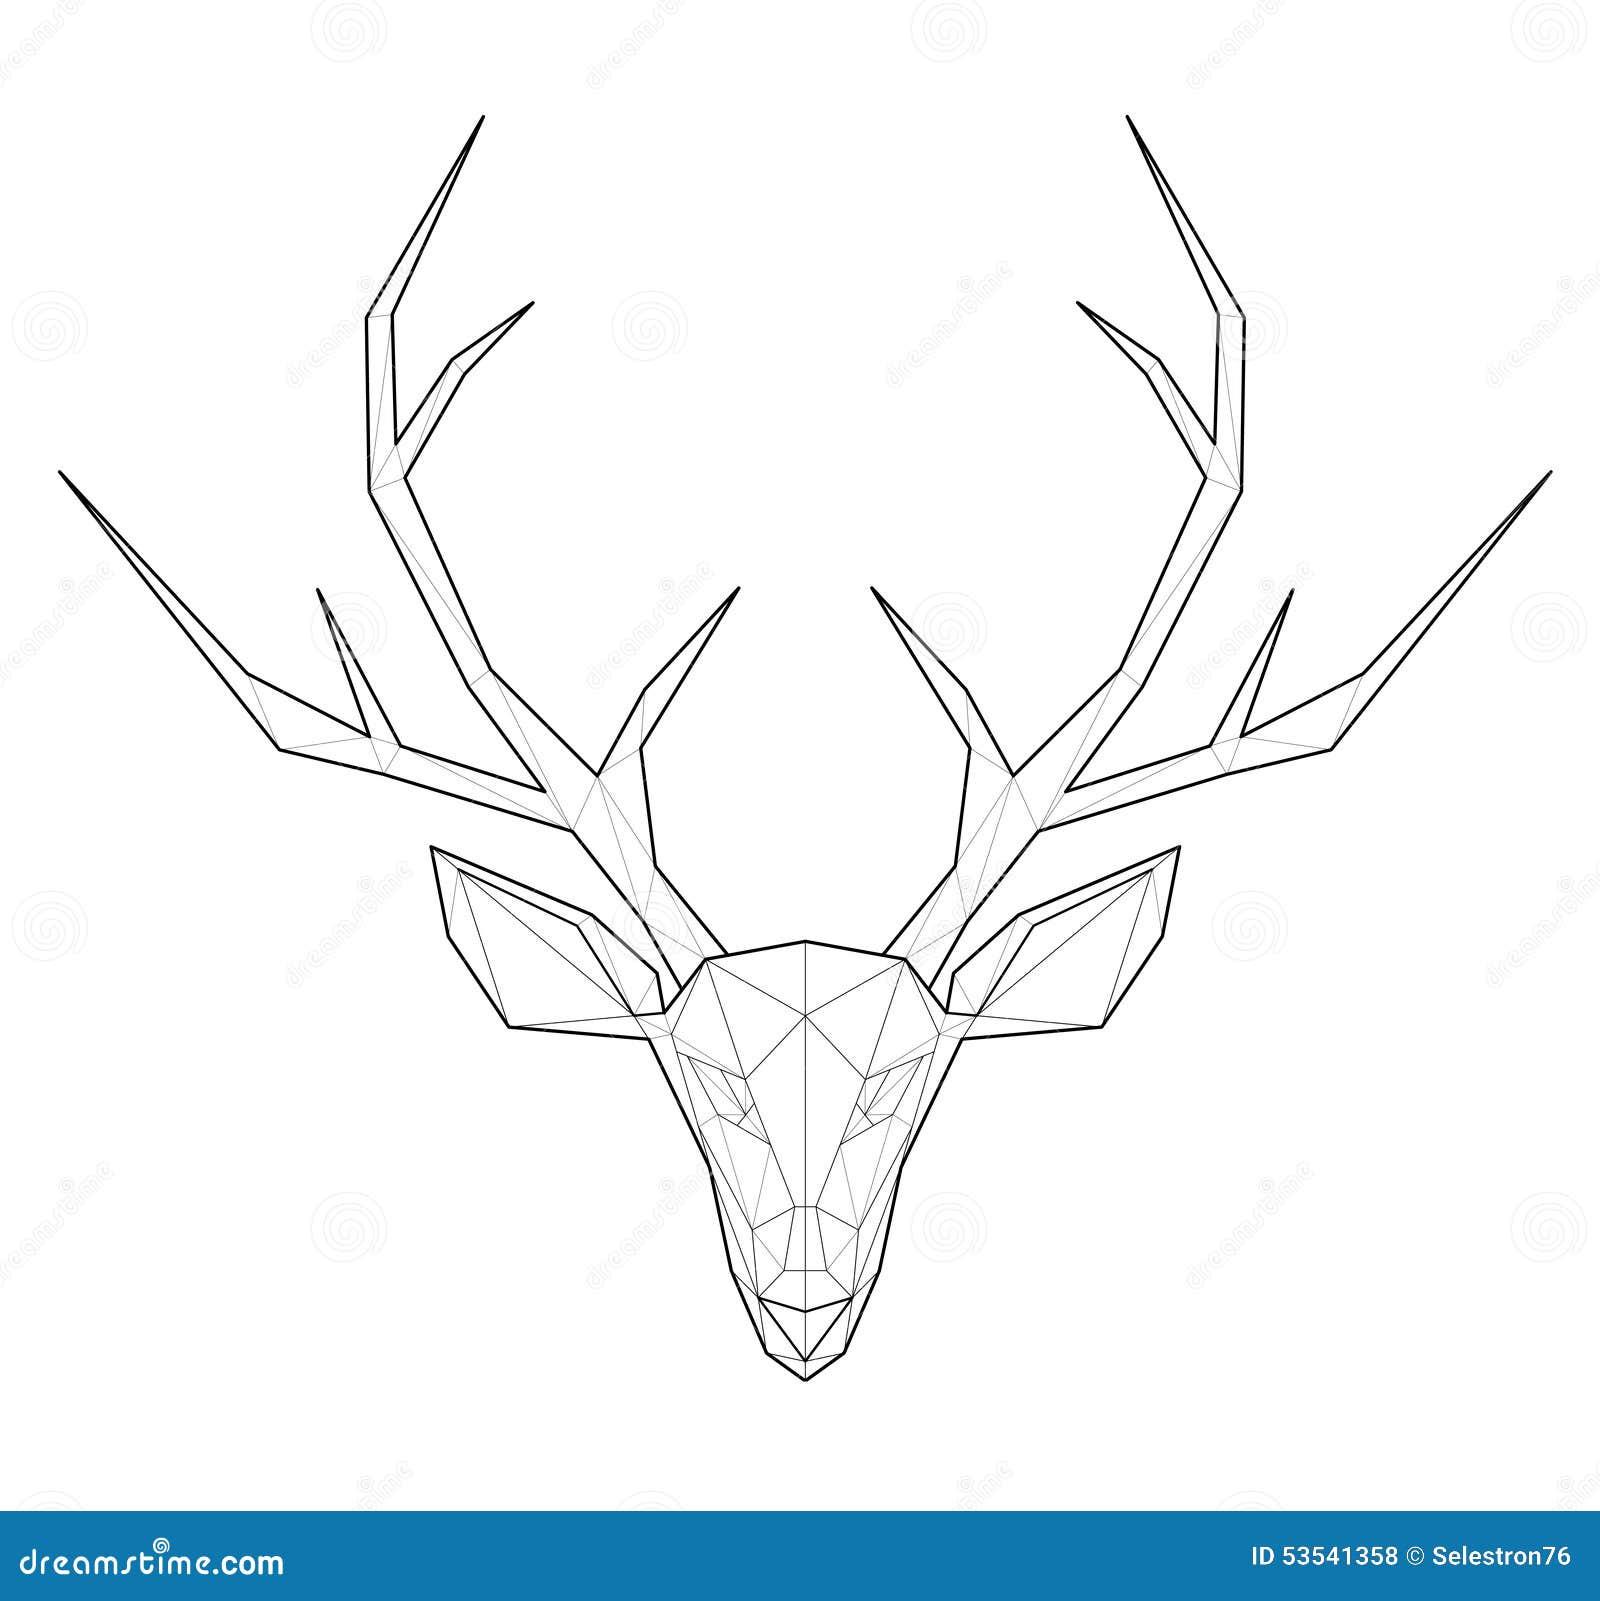 horned deer low polygon illustration stock vector deer antler vector images deer antler vector images